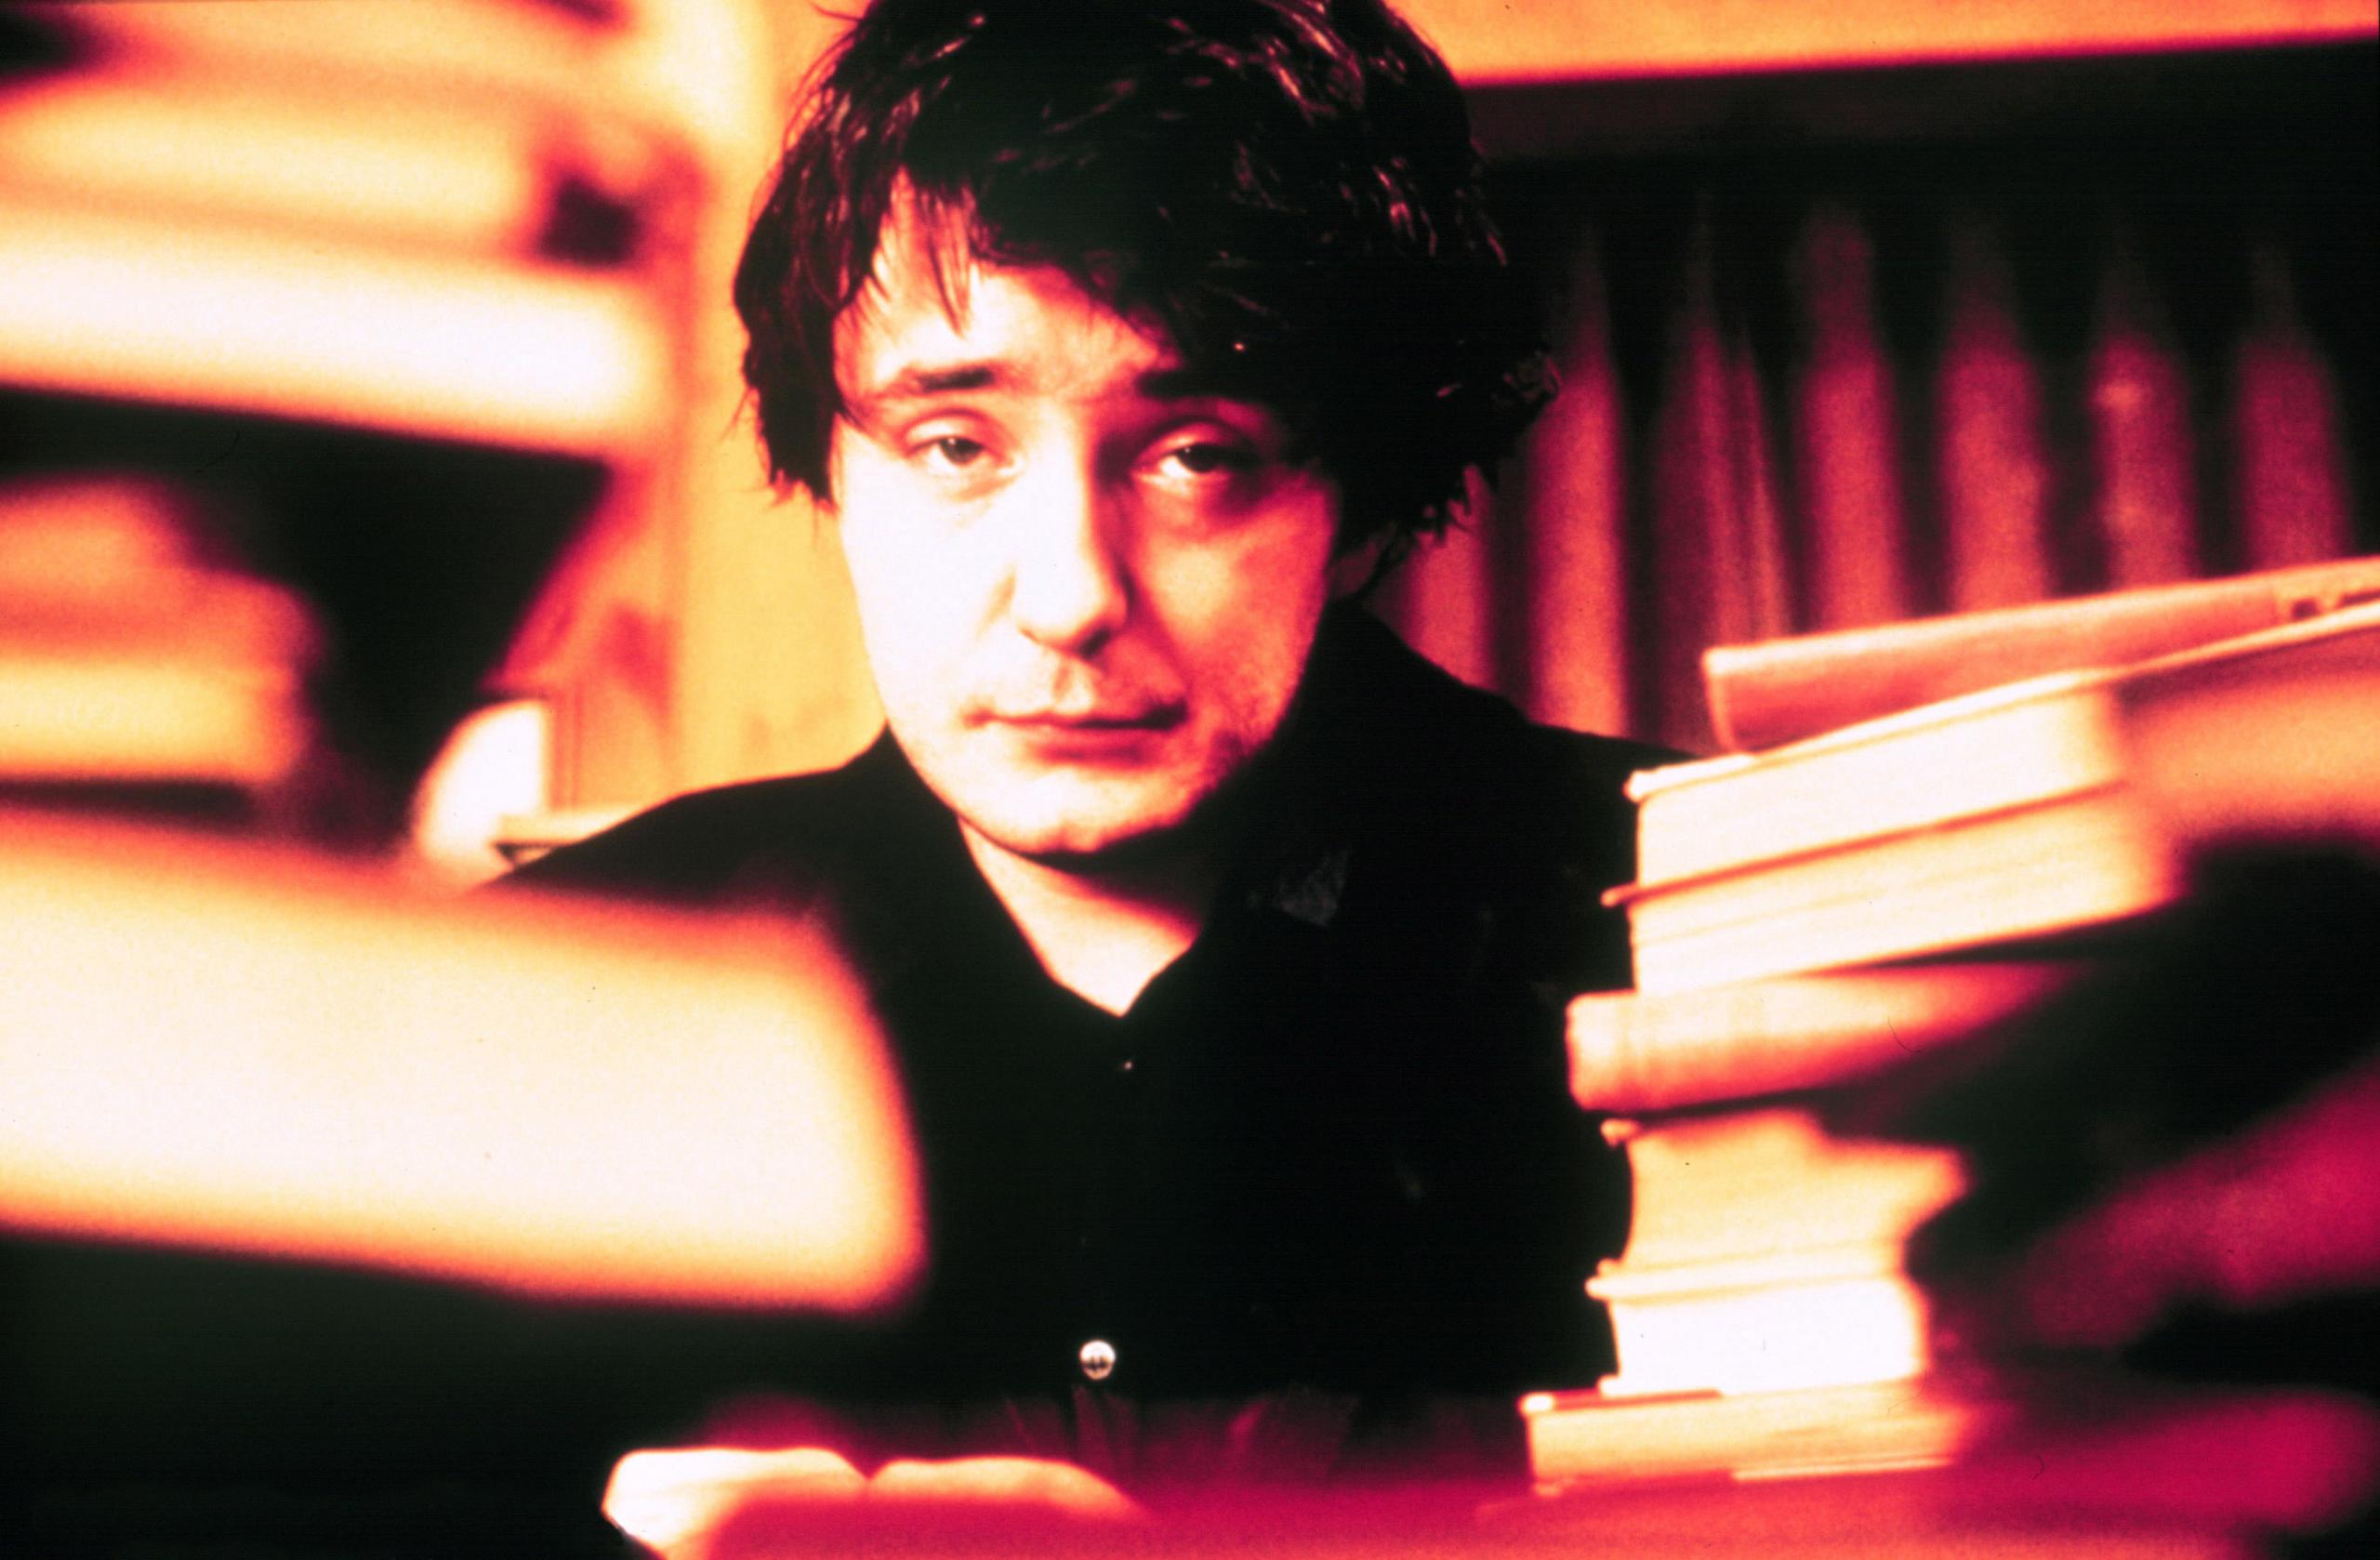 Arbus diane dissertation fairy grown panorama s social tale ups